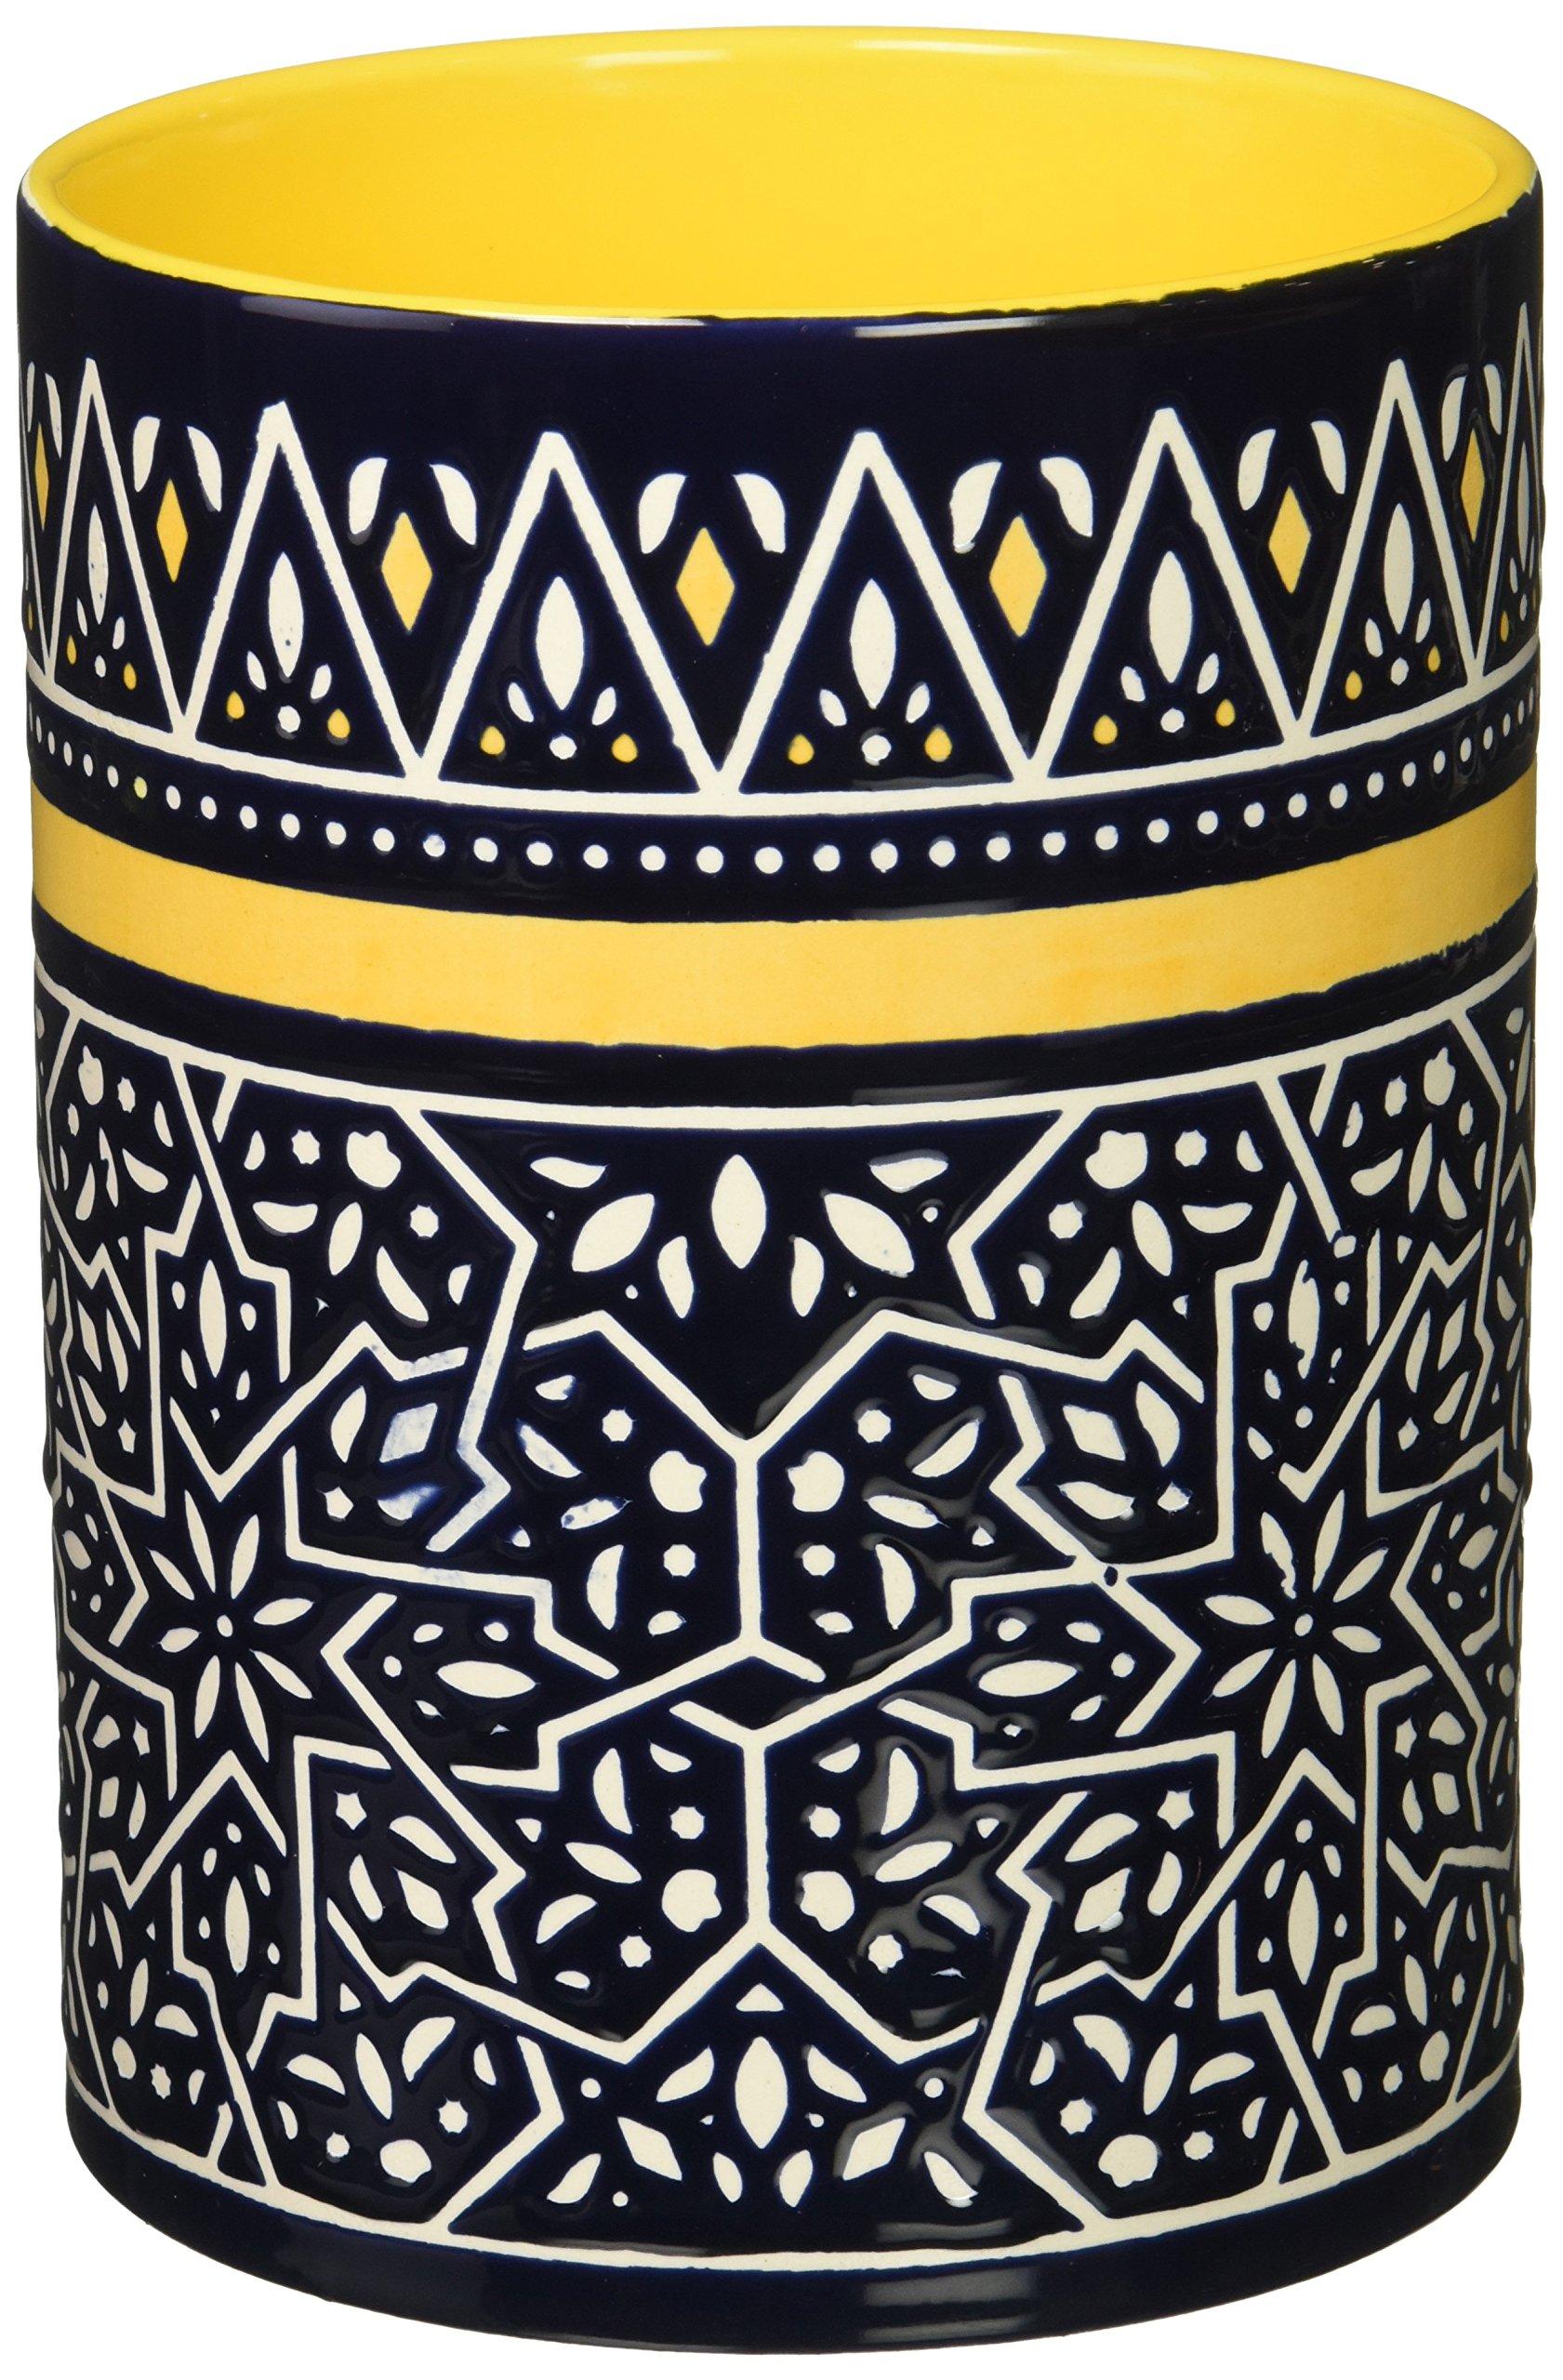 Now Designs Stoneware Utensil Crock, Medina Design by Now Designs